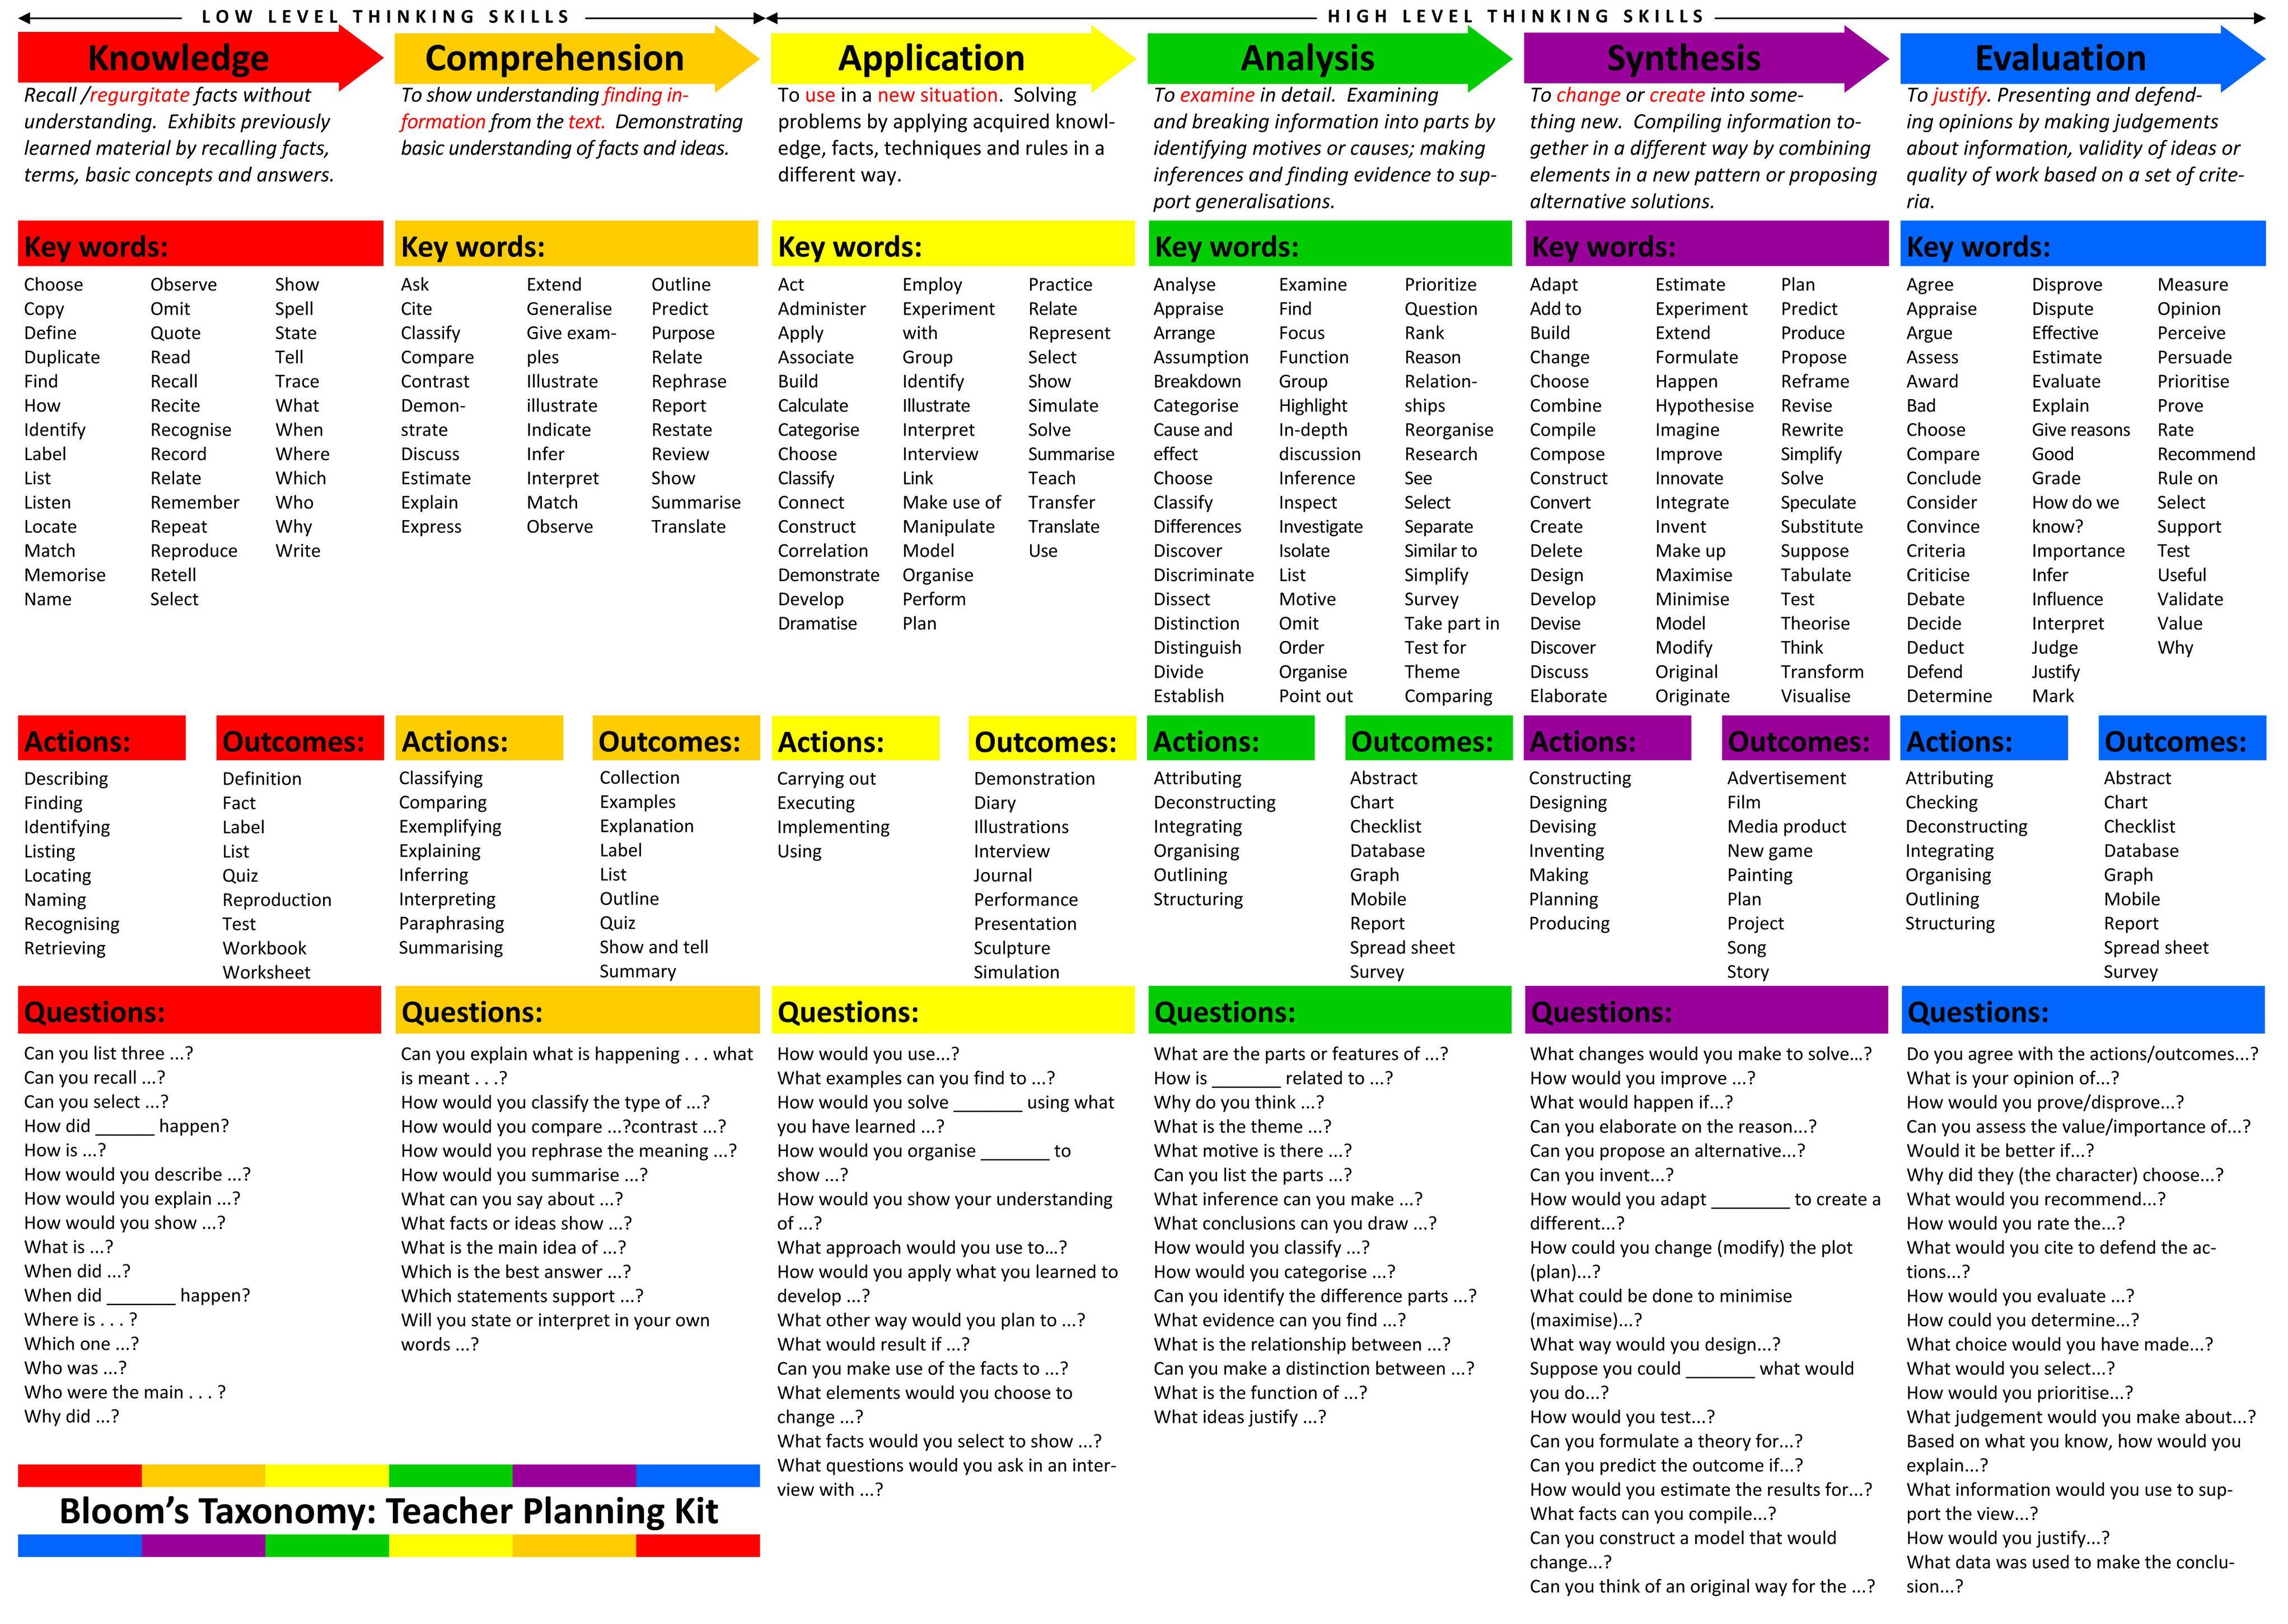 Blooms Taxonomy Teacher Planning Kit